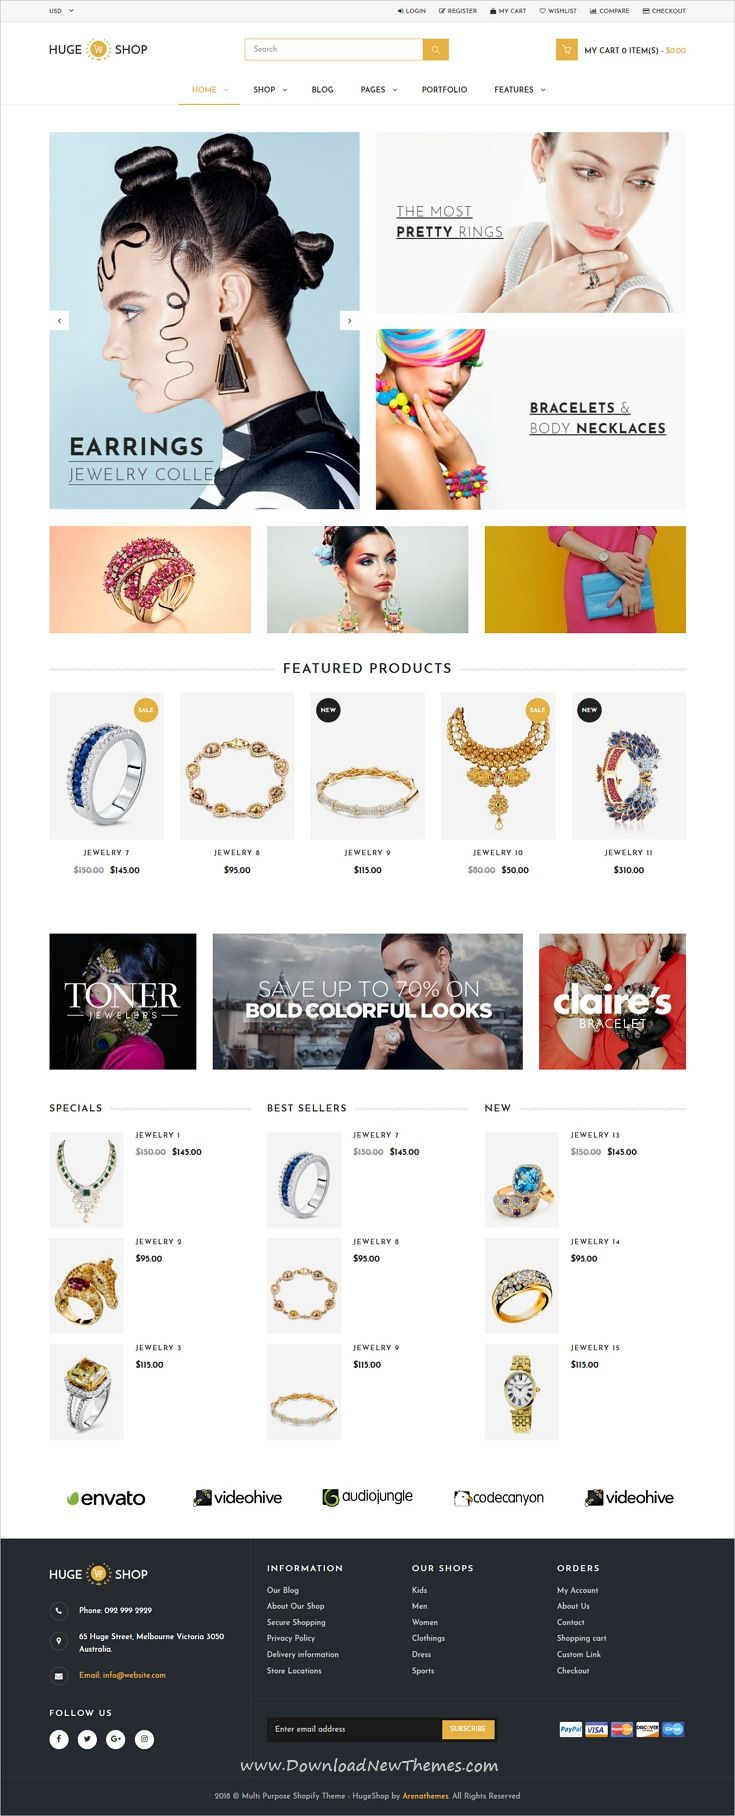 Hugeshop multipurpose shopify theme template